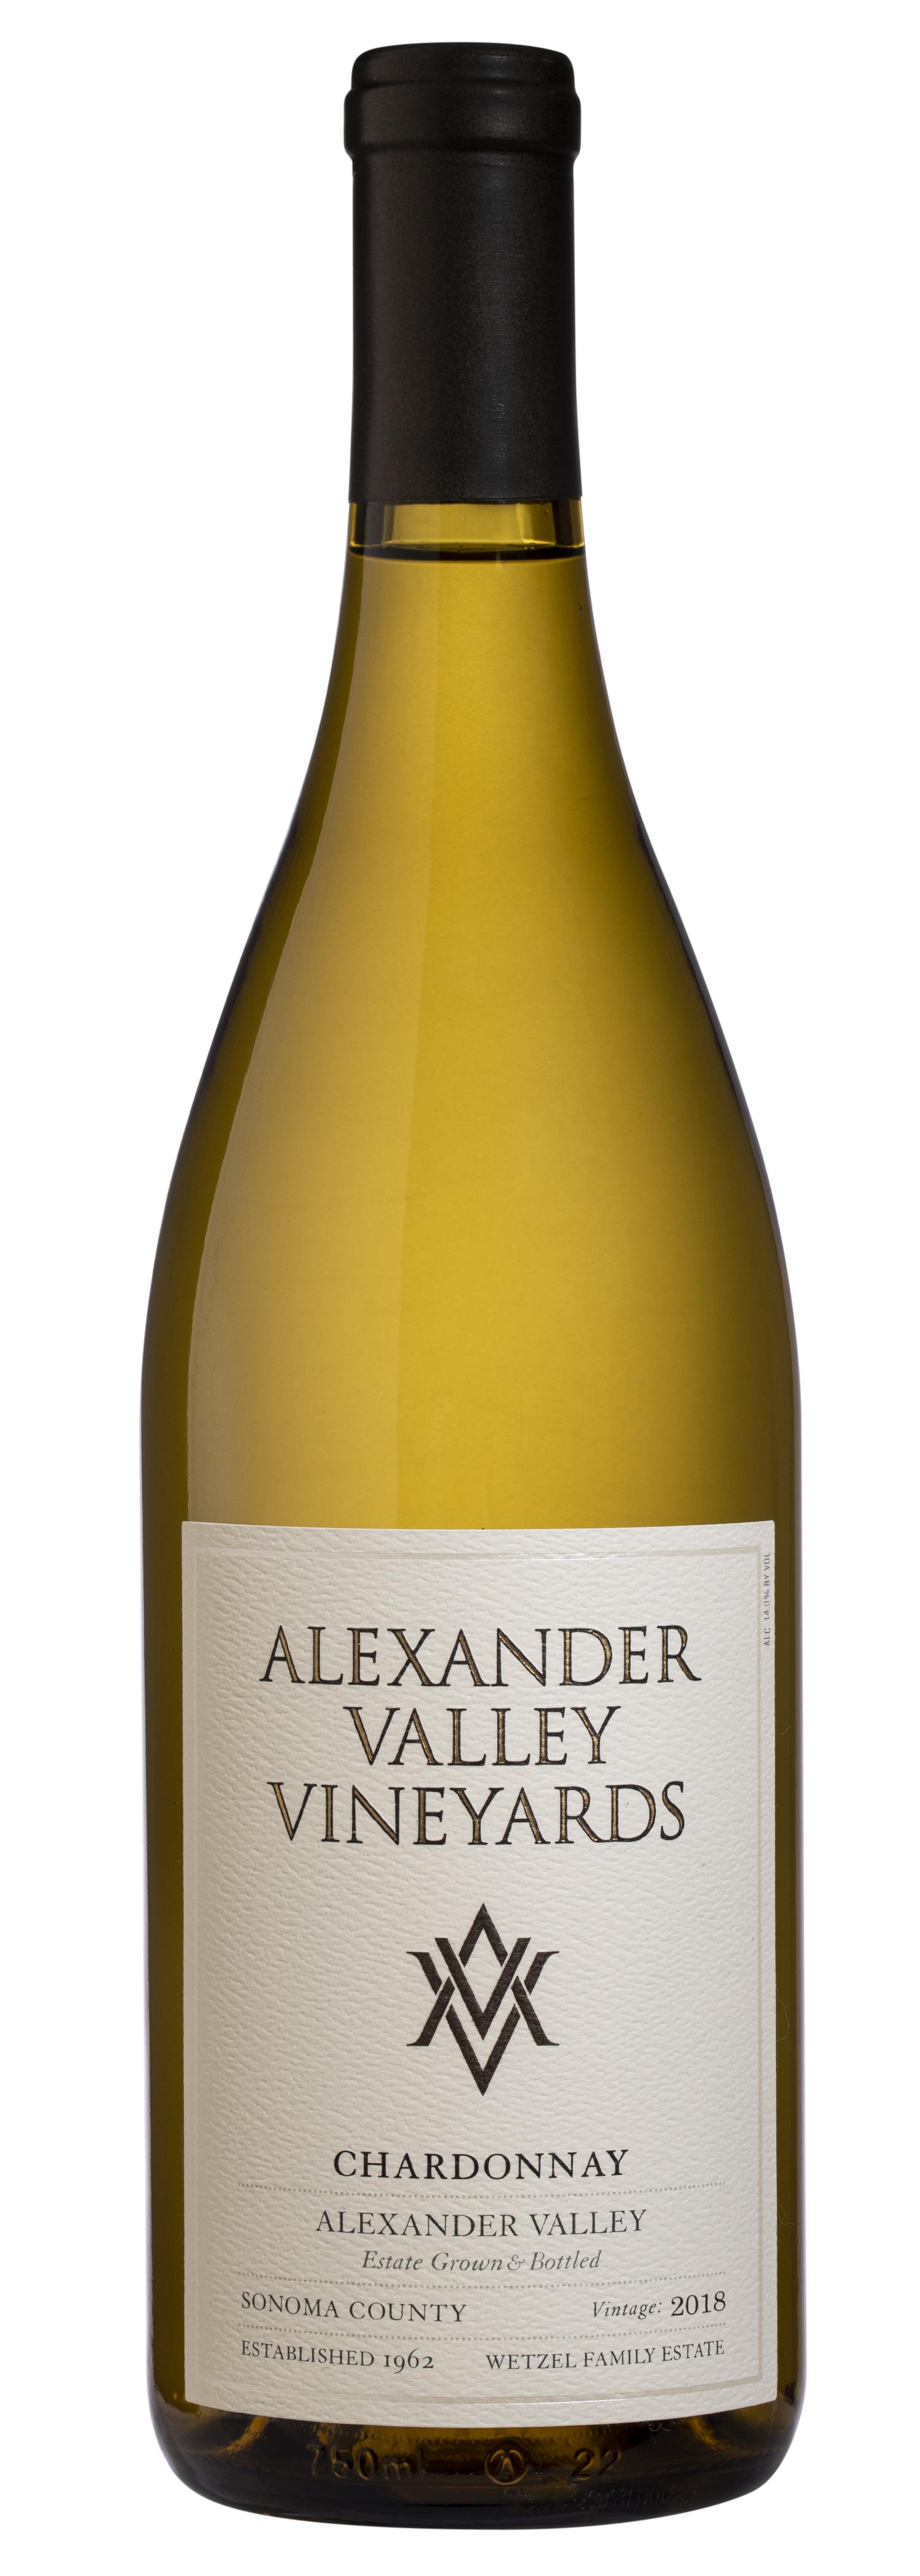 Alexander Valley Vineyards Chardonnay 2018